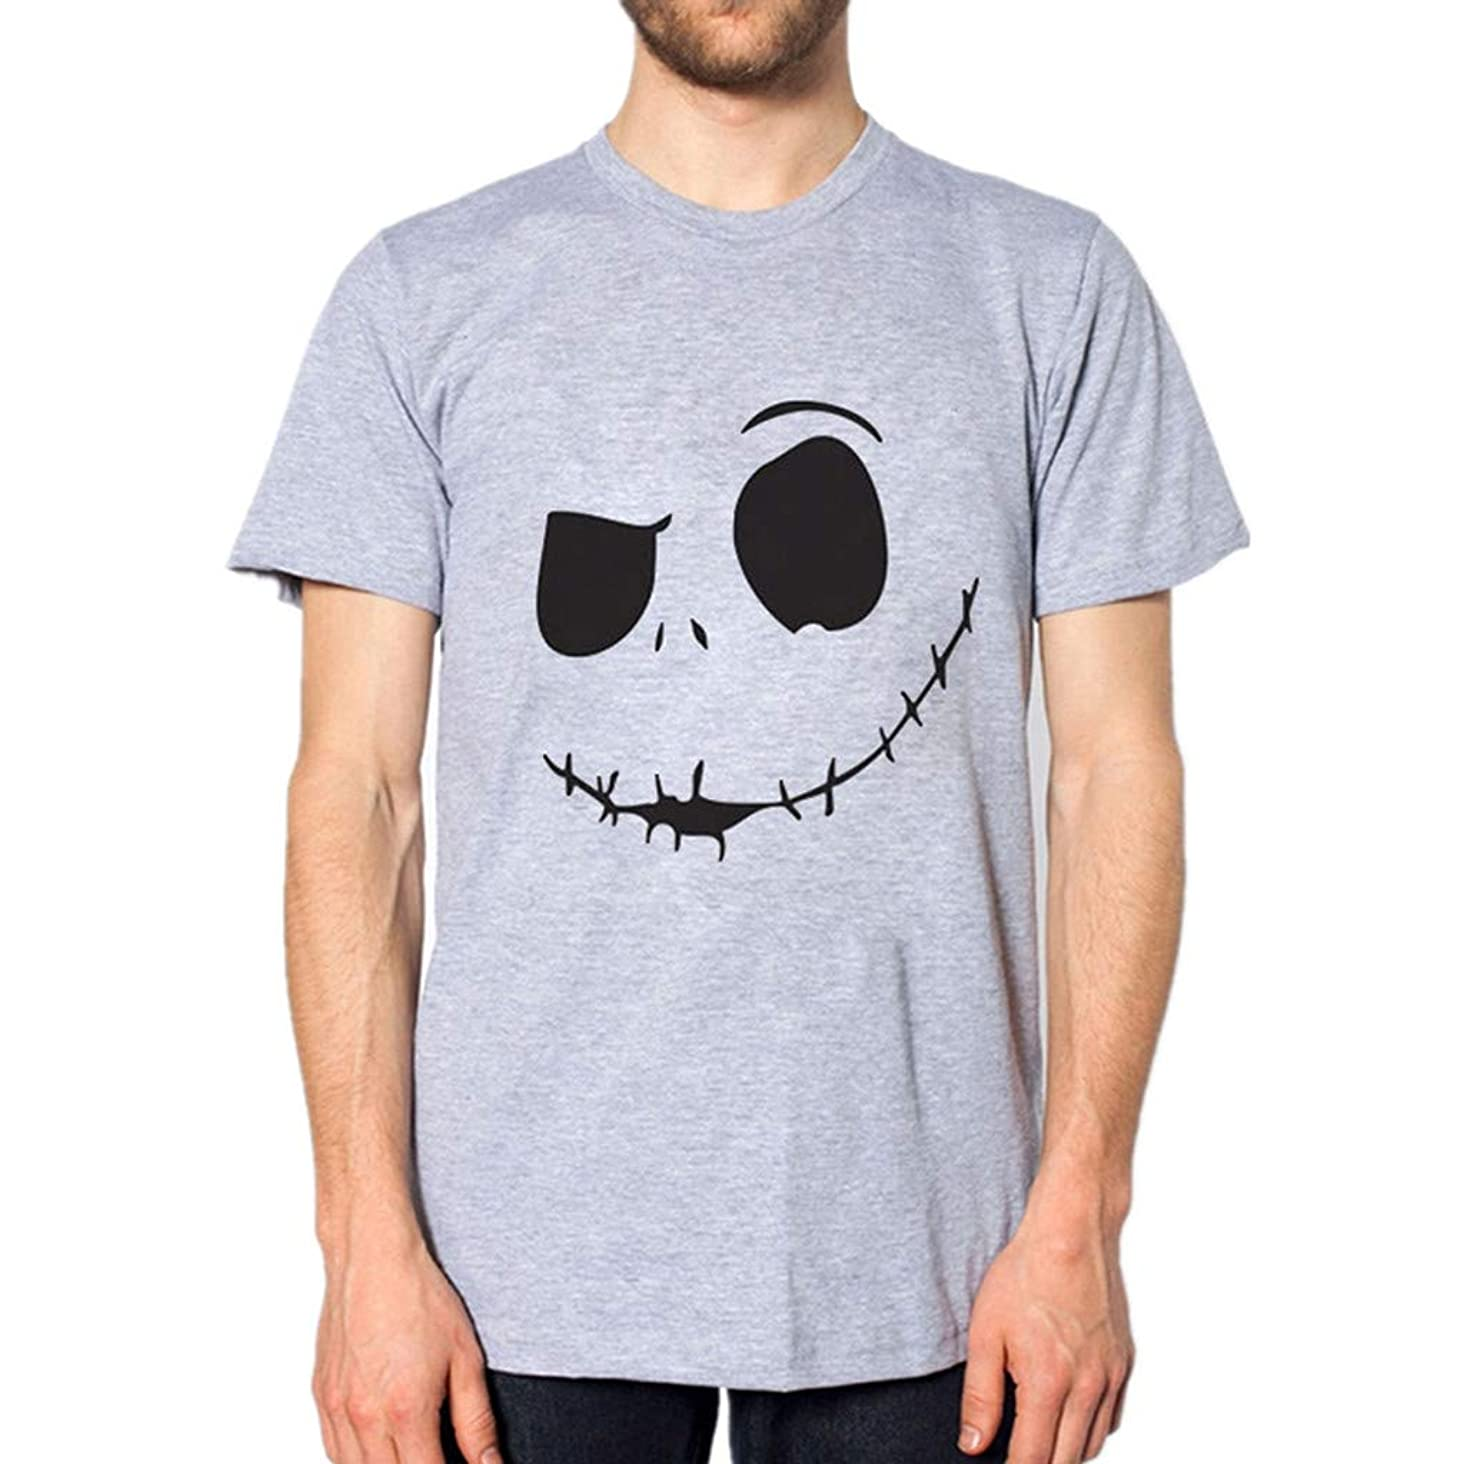 Men's Summer Tops Duseedik New Evil Smile Face Printed Round Collar Comfortable T-Shirt Top Blouse